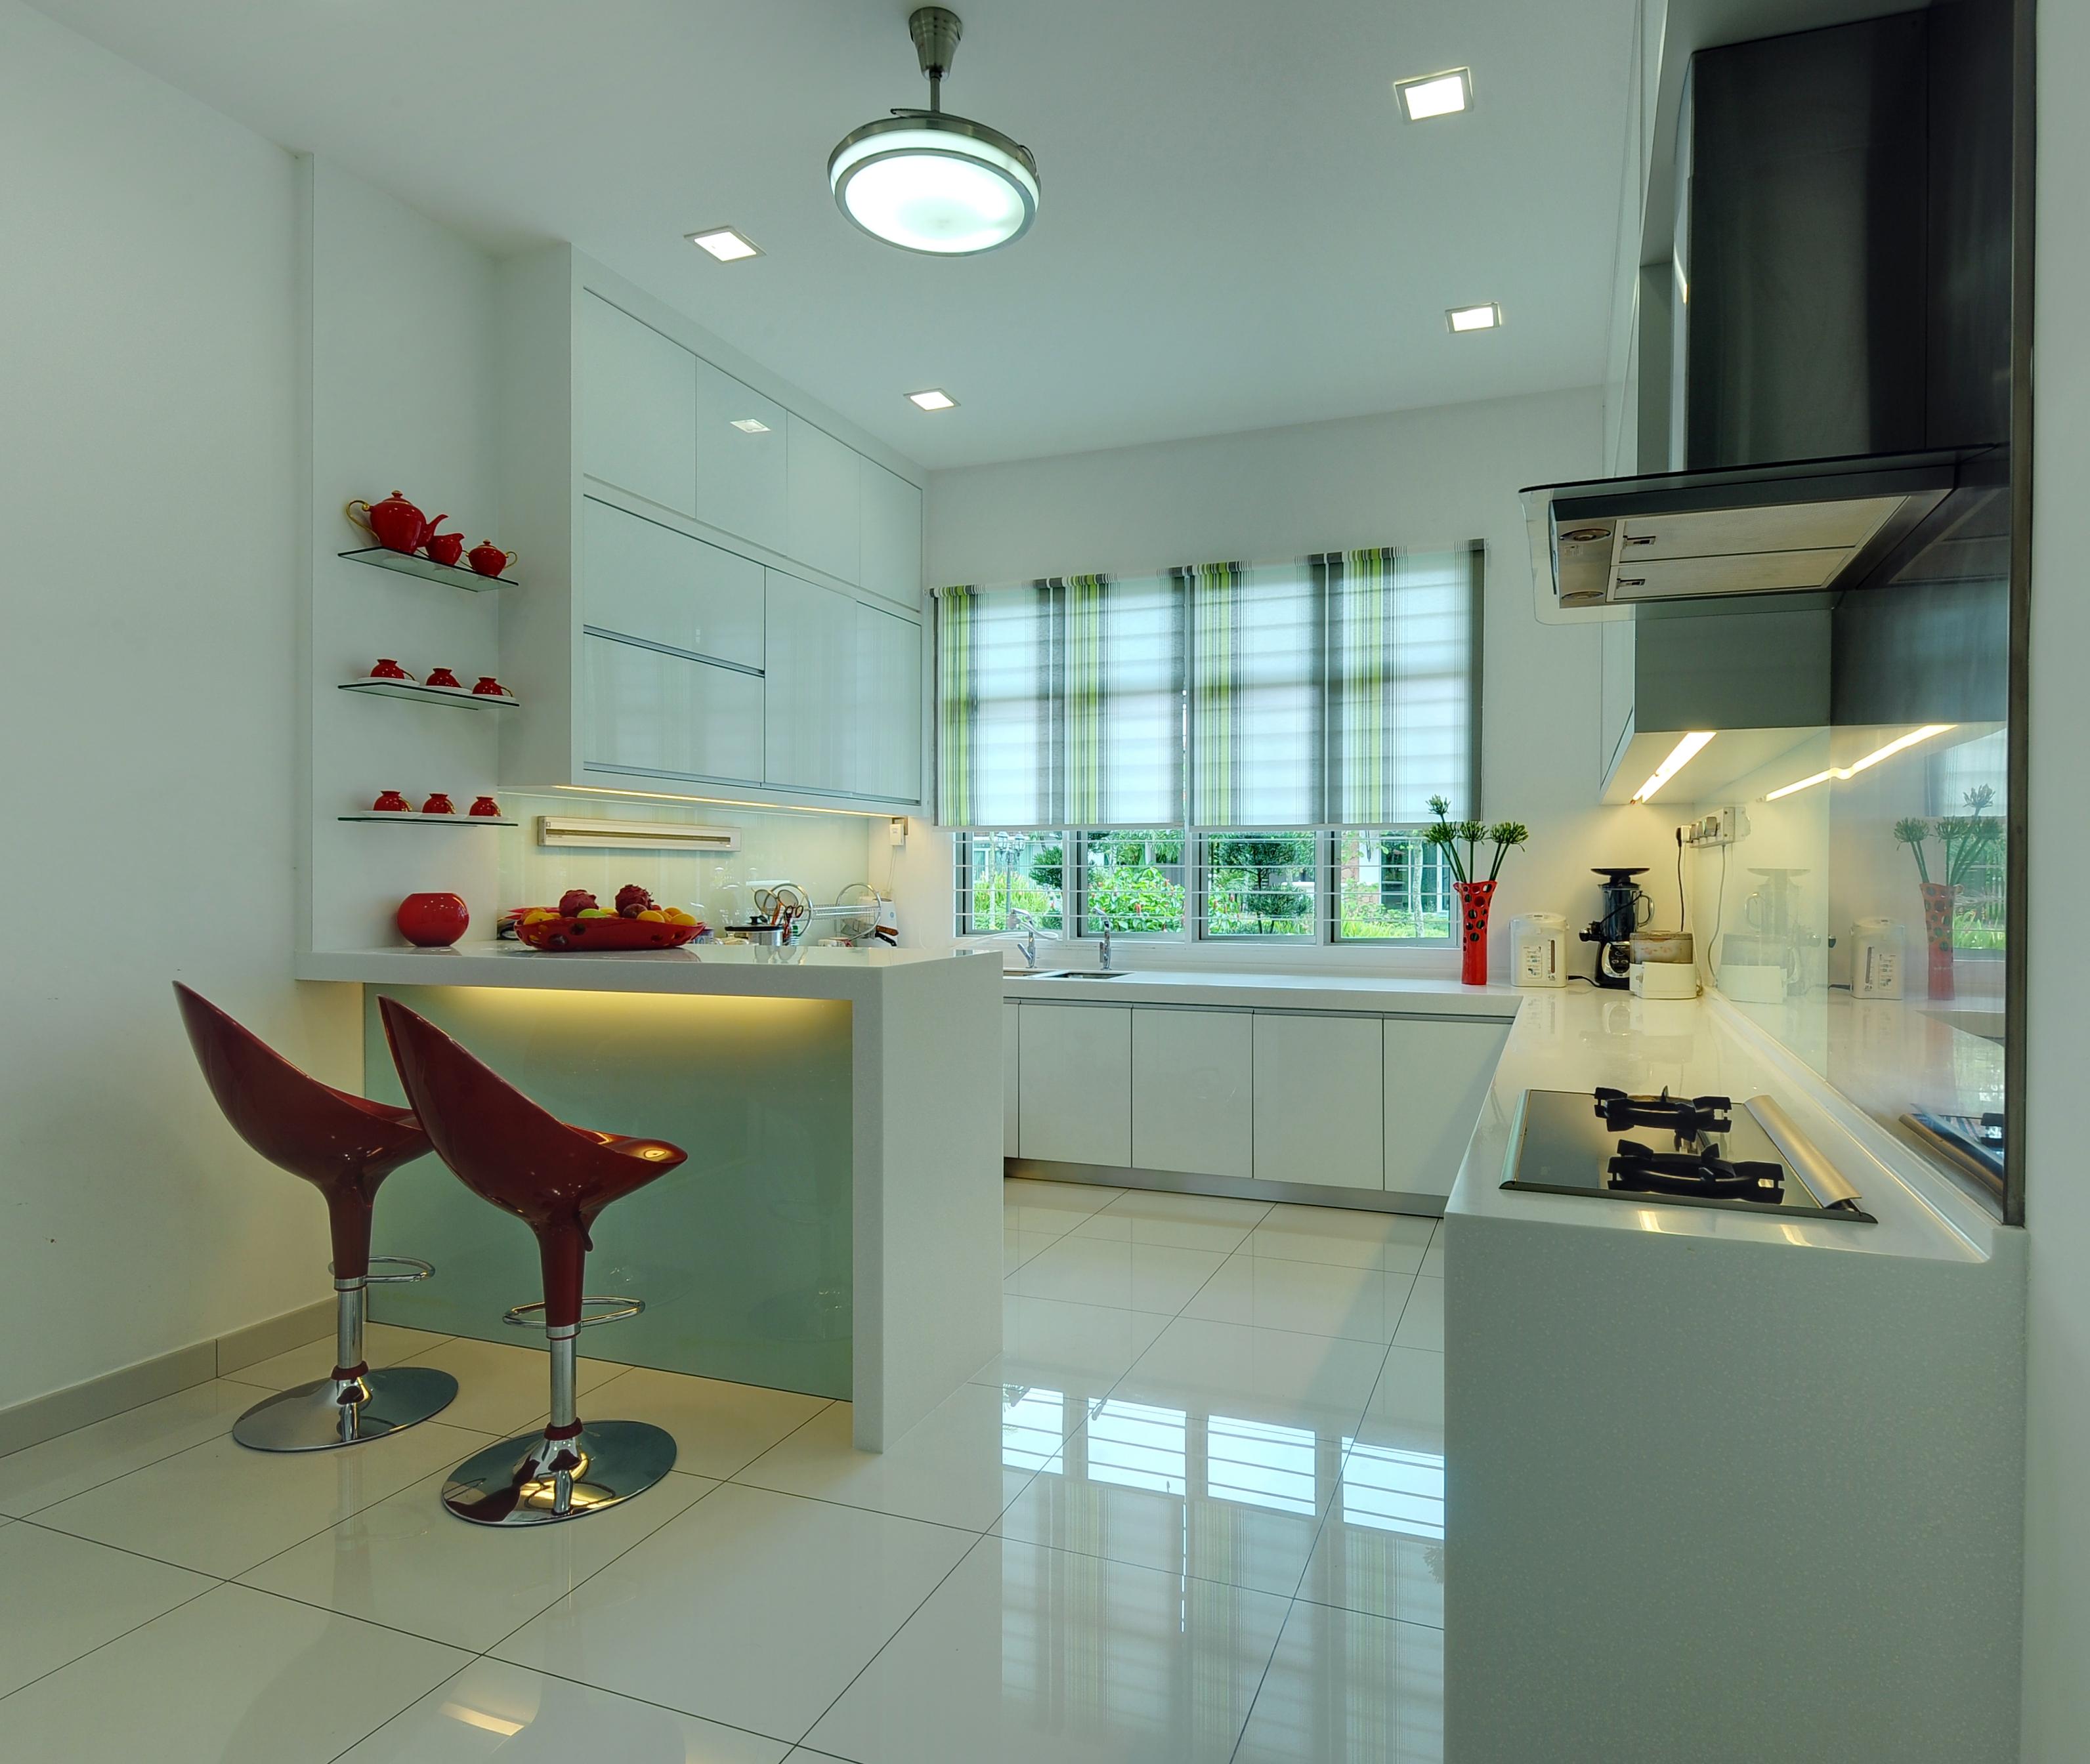 Malaysia Most Common Kitchen Countertops RENOF Article